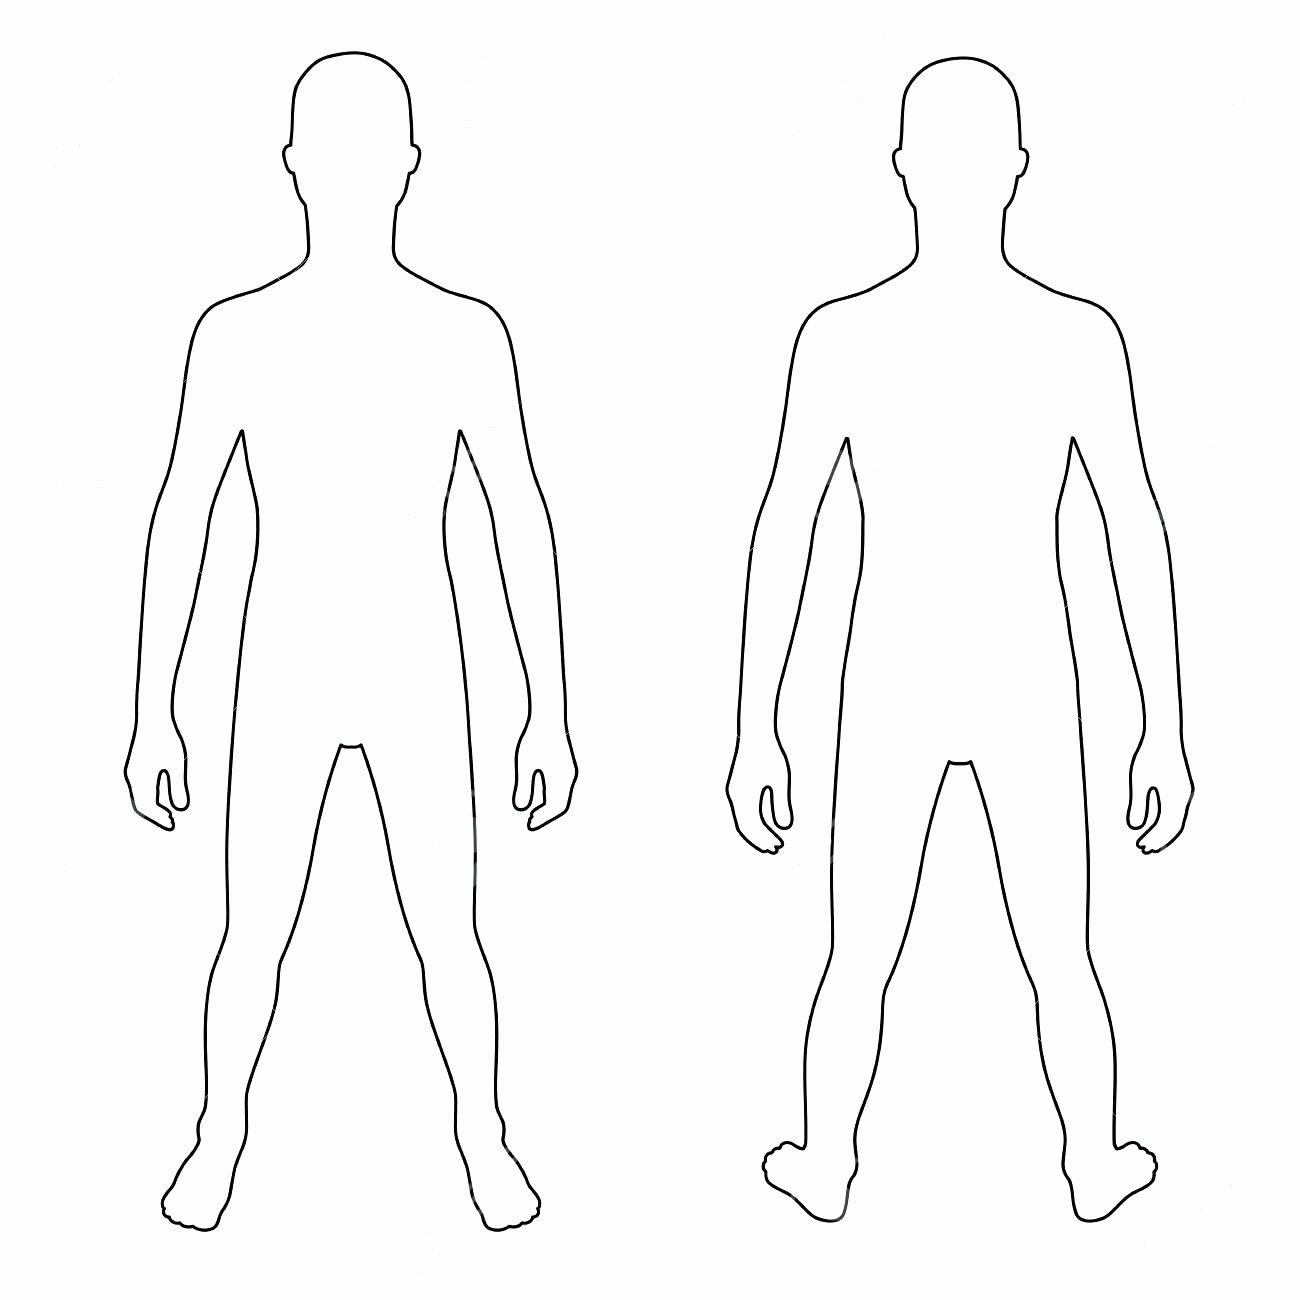 Blank Female Body Template Luxury Human Body Outline